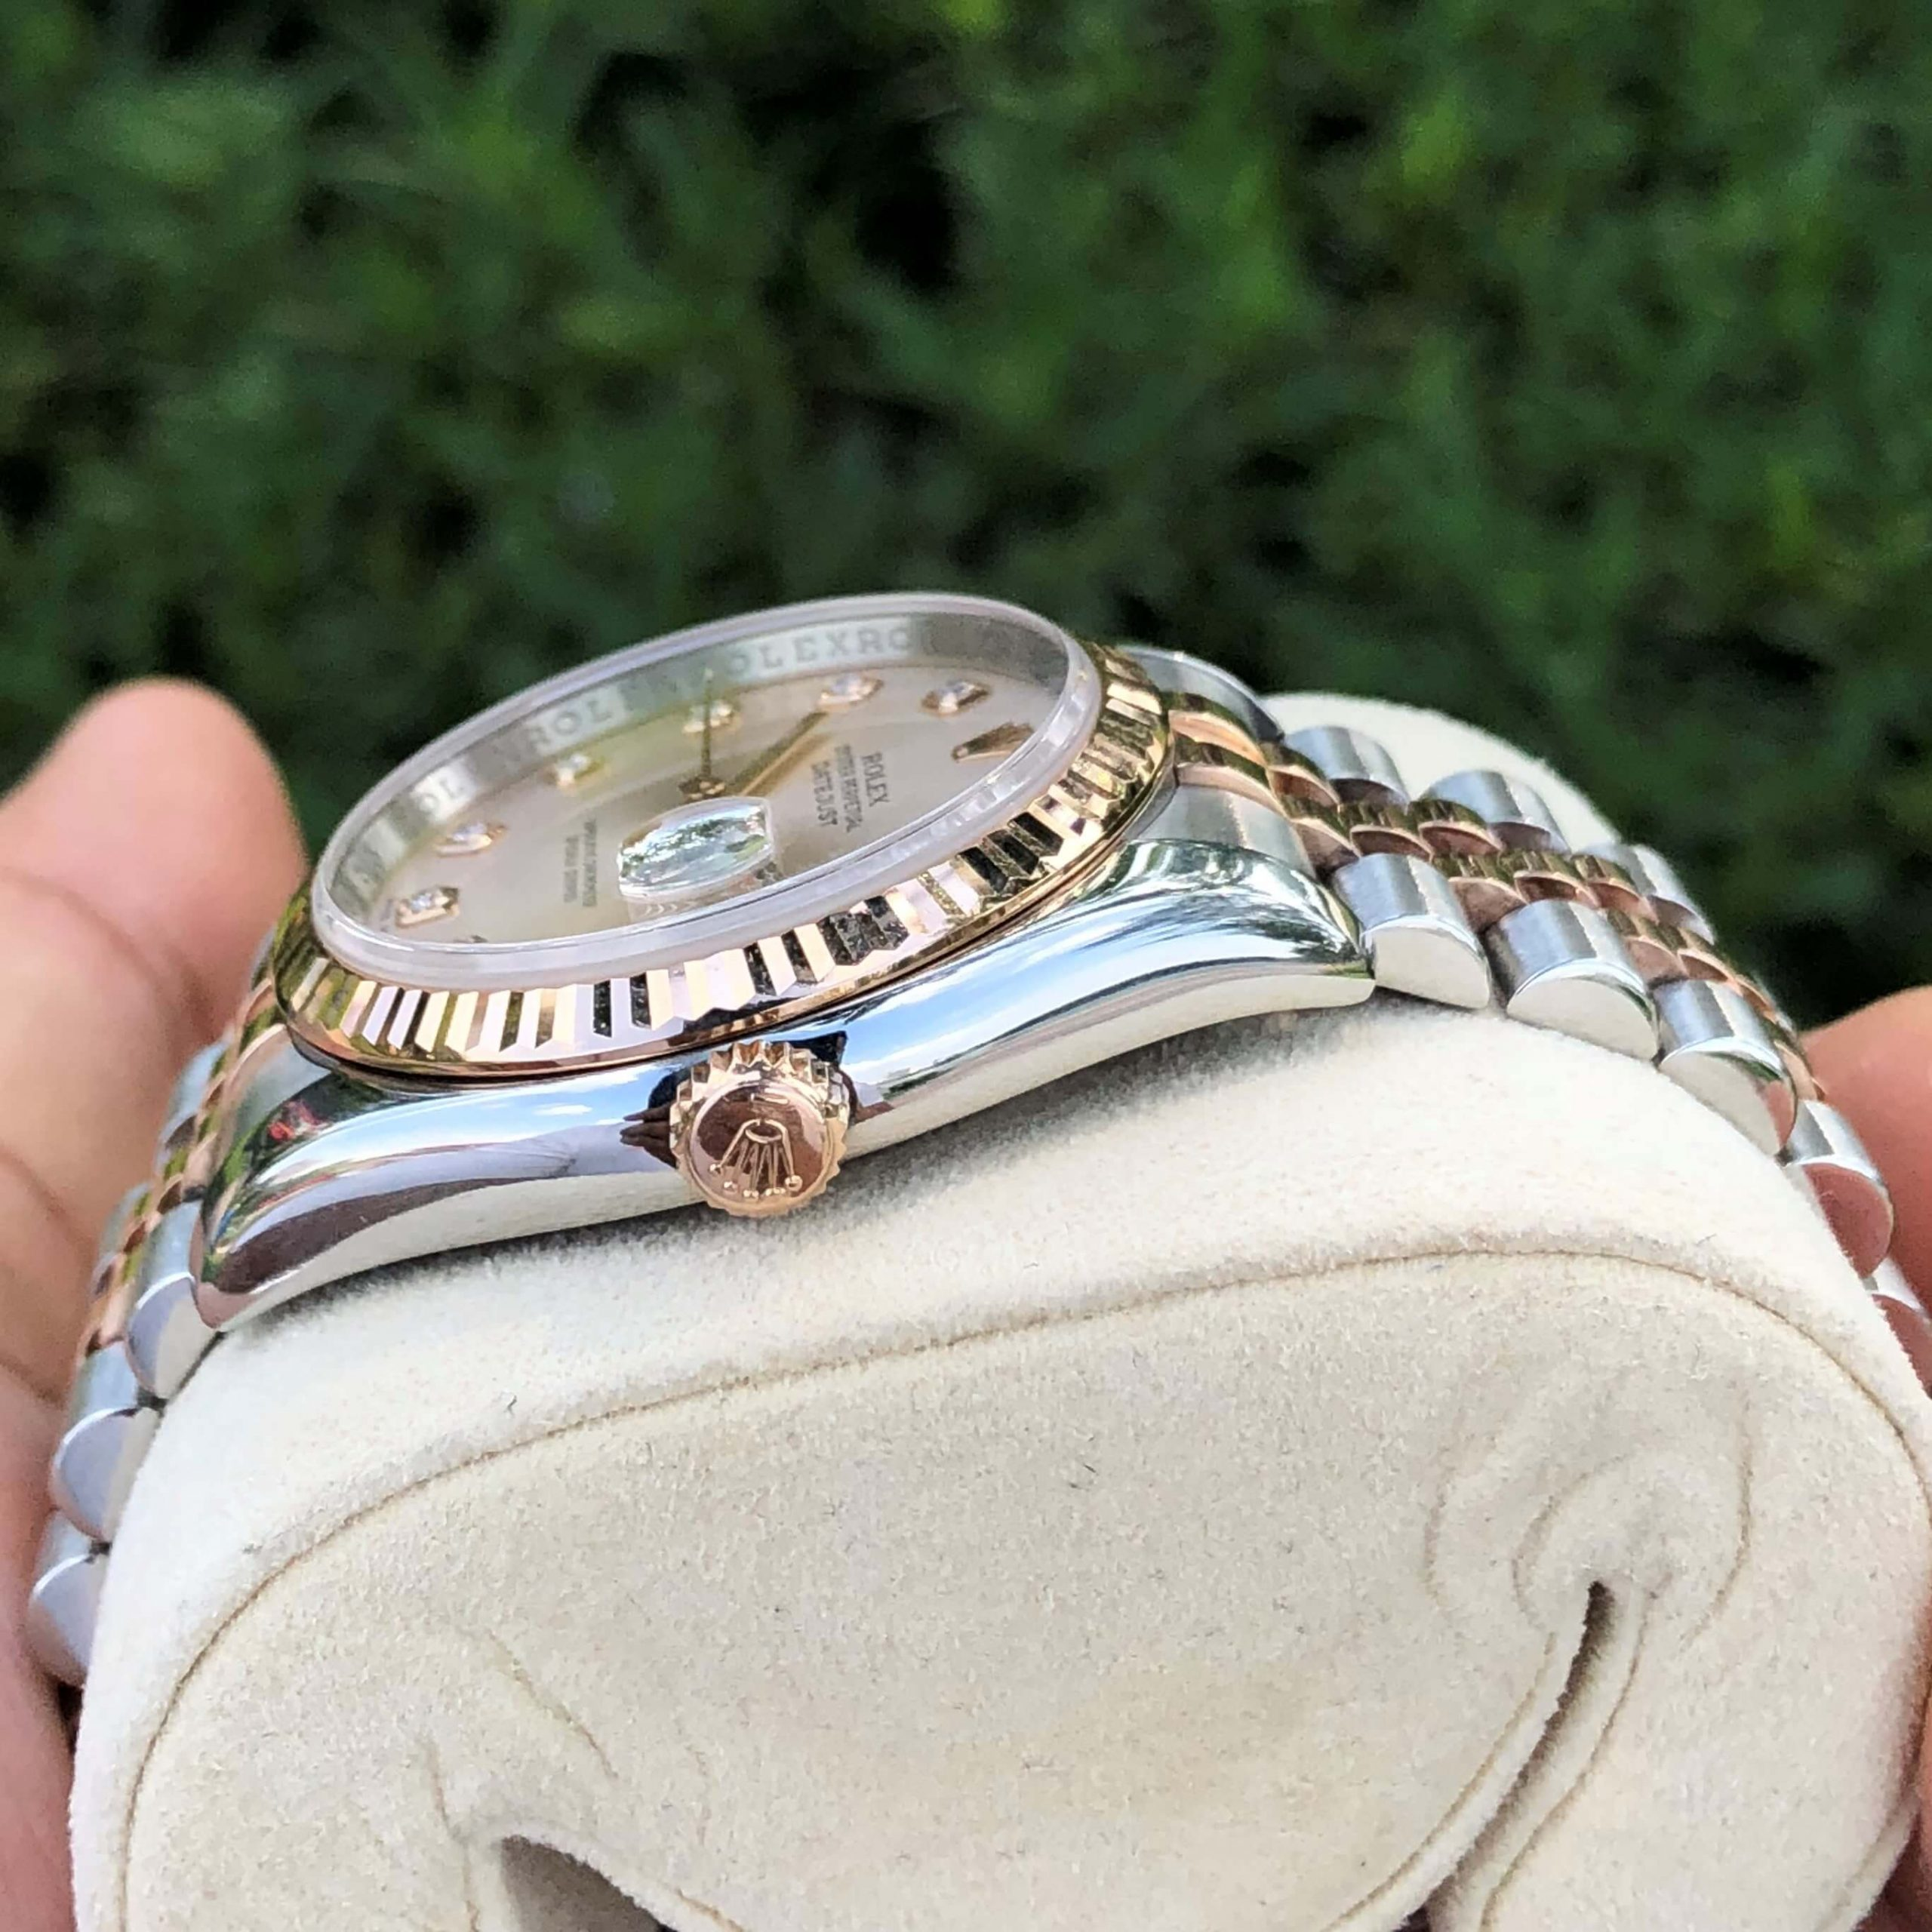 Đồng hồ Rolex Datejust 116231 Mặt phấn hồng Demi vàng hồng 18k